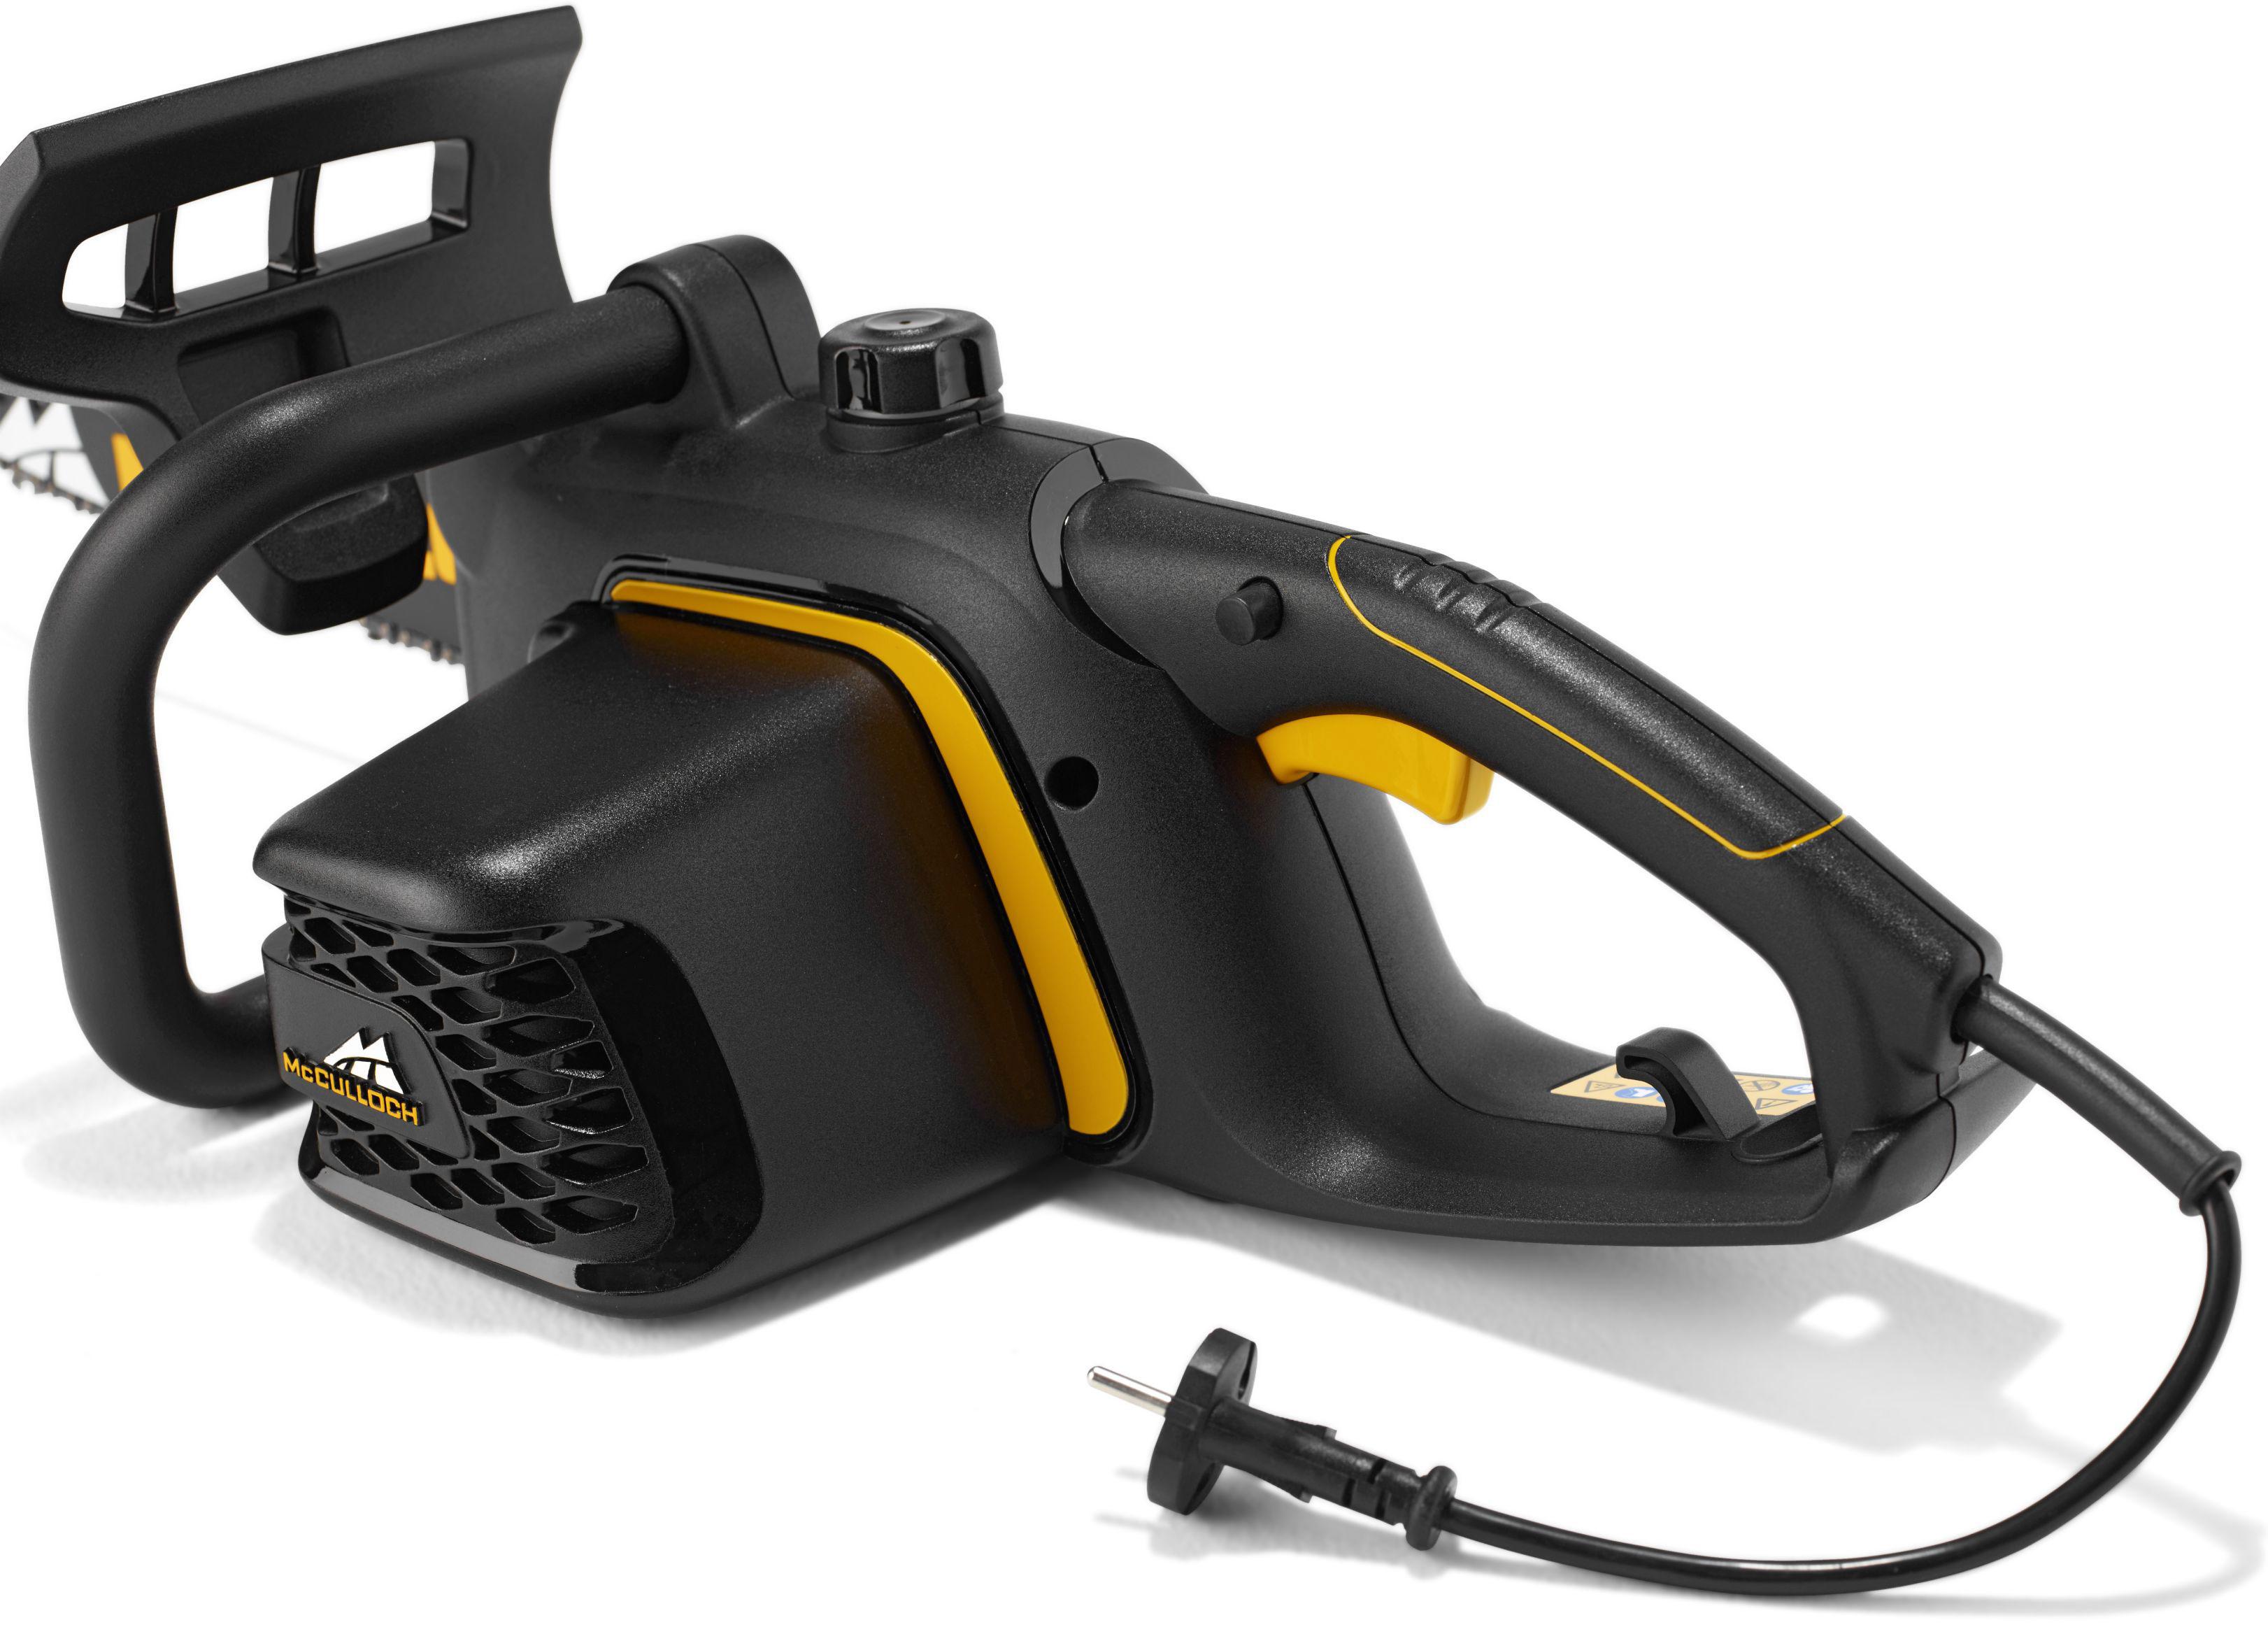 mcculloch elektro kettens ge cse2040s motors ge 40 cm bei. Black Bedroom Furniture Sets. Home Design Ideas